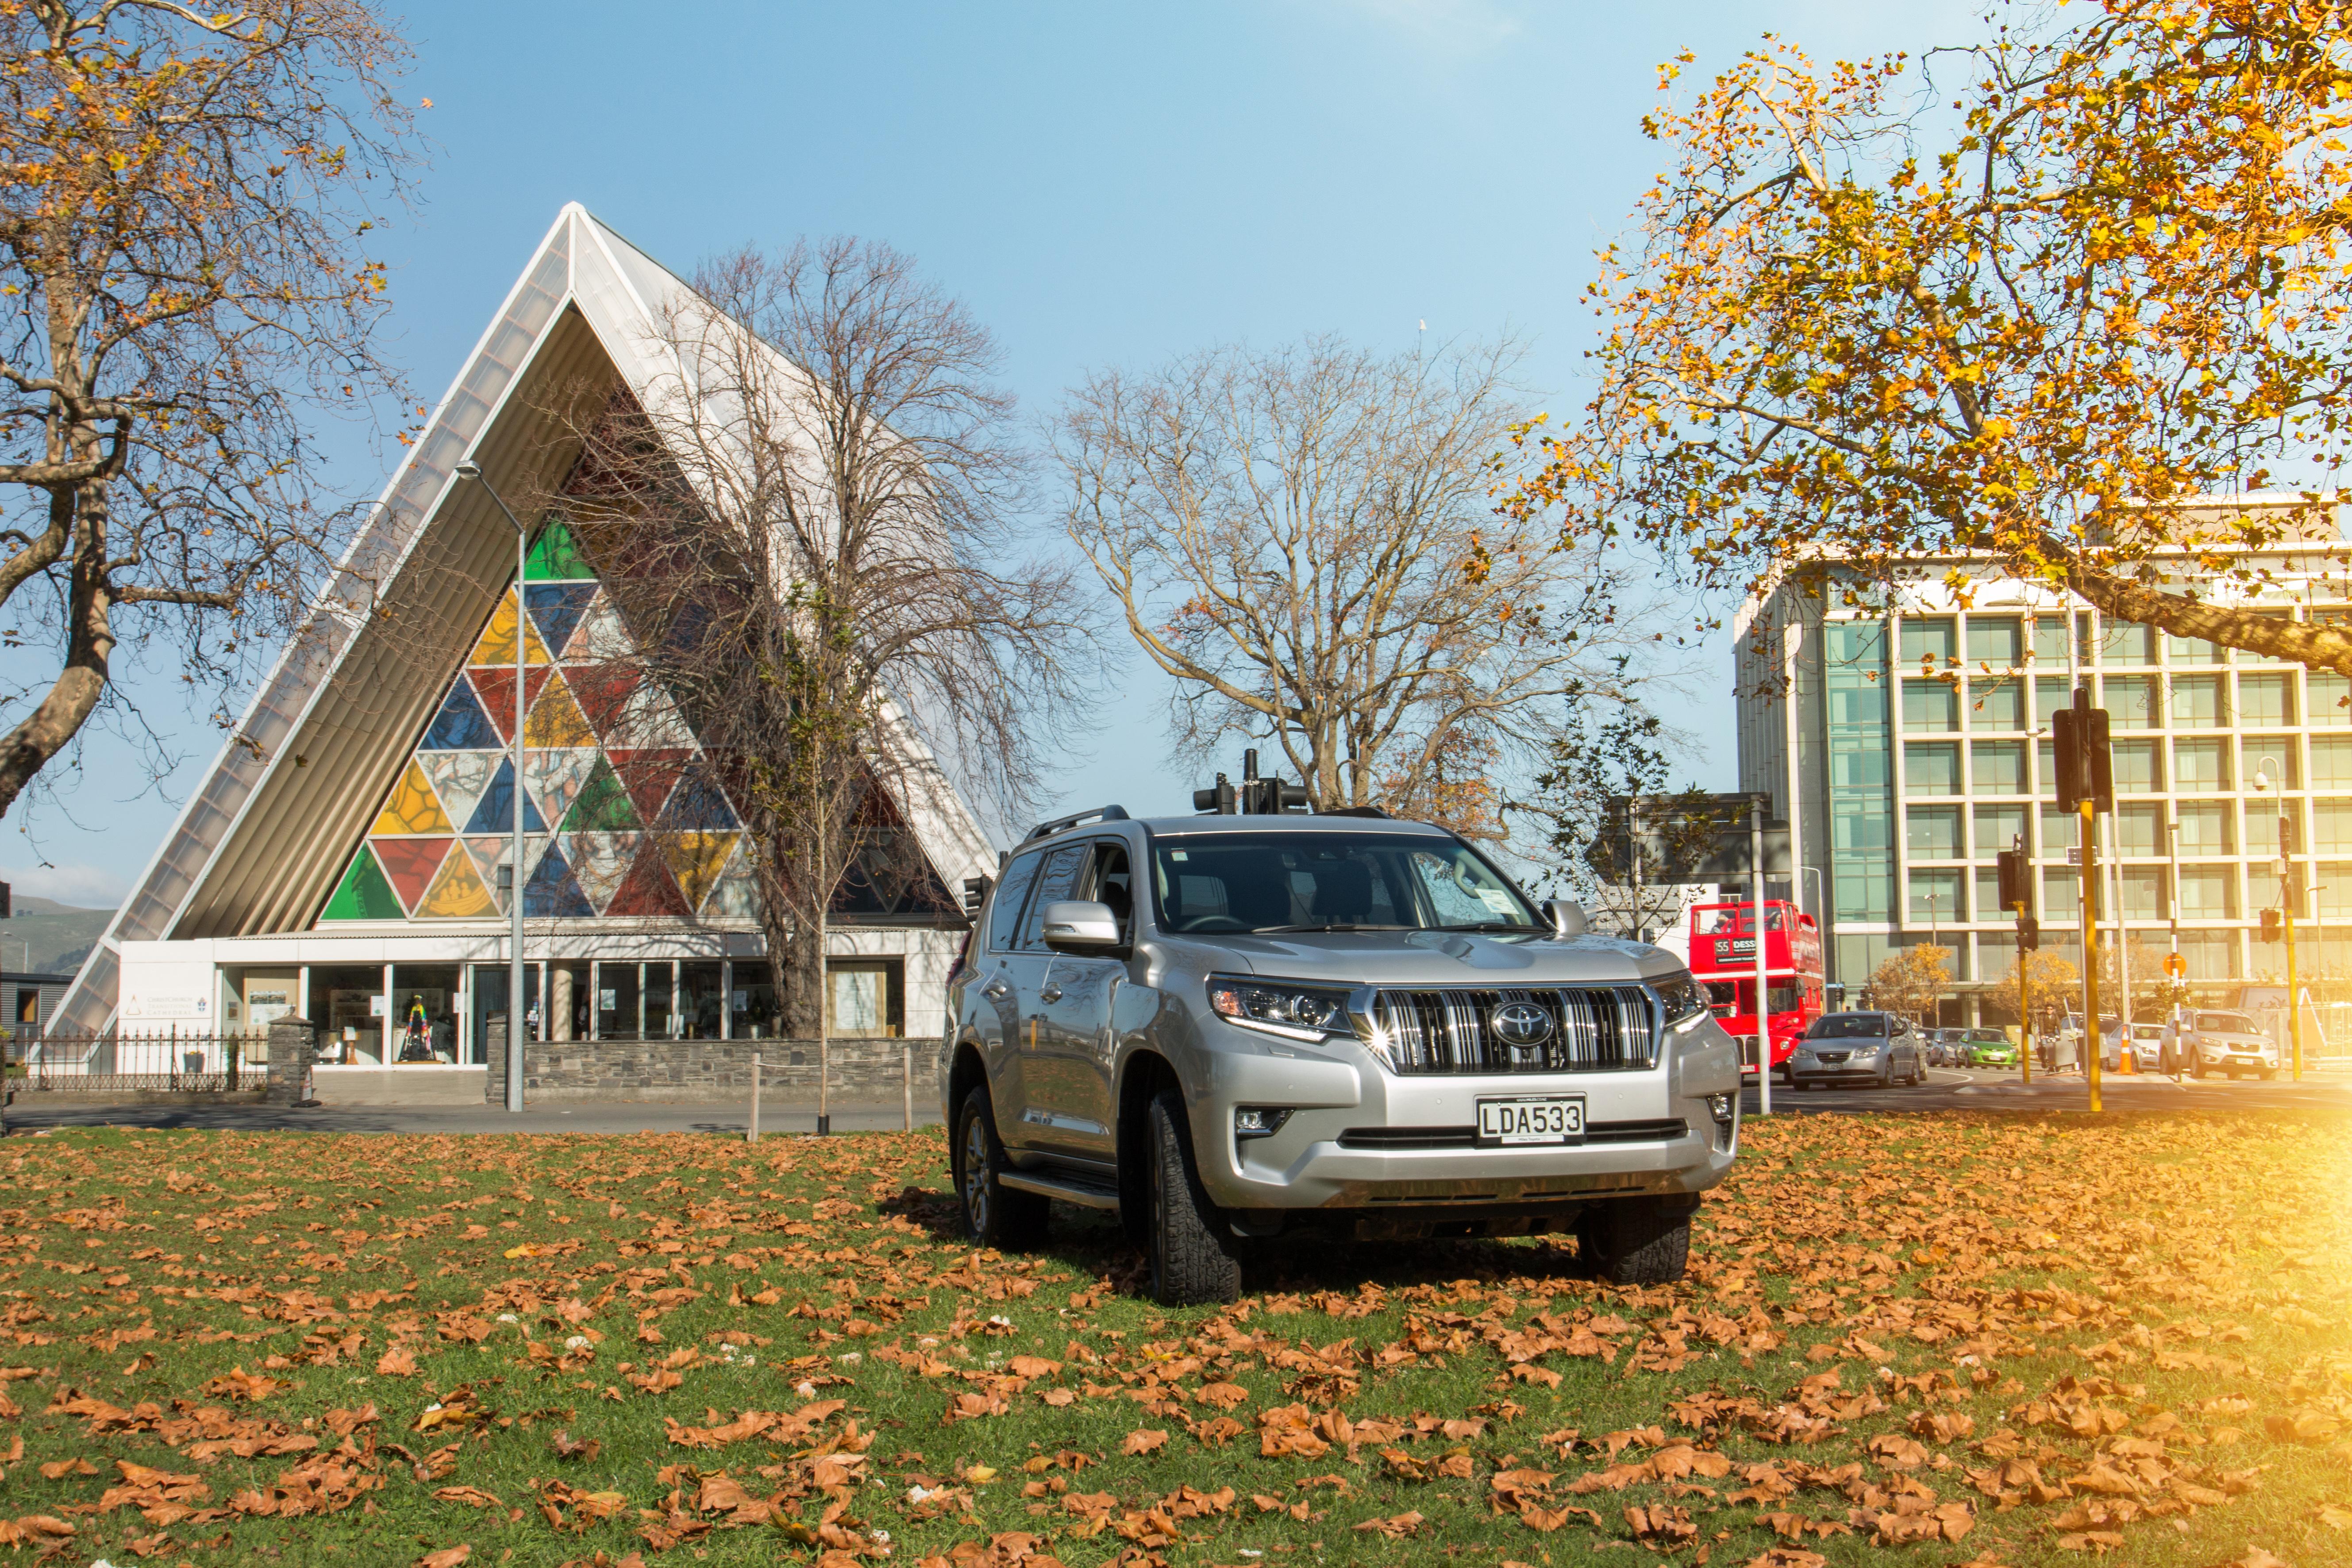 Touchdown Car Rentals, Canterbury, NZ - 37 travel reviews for